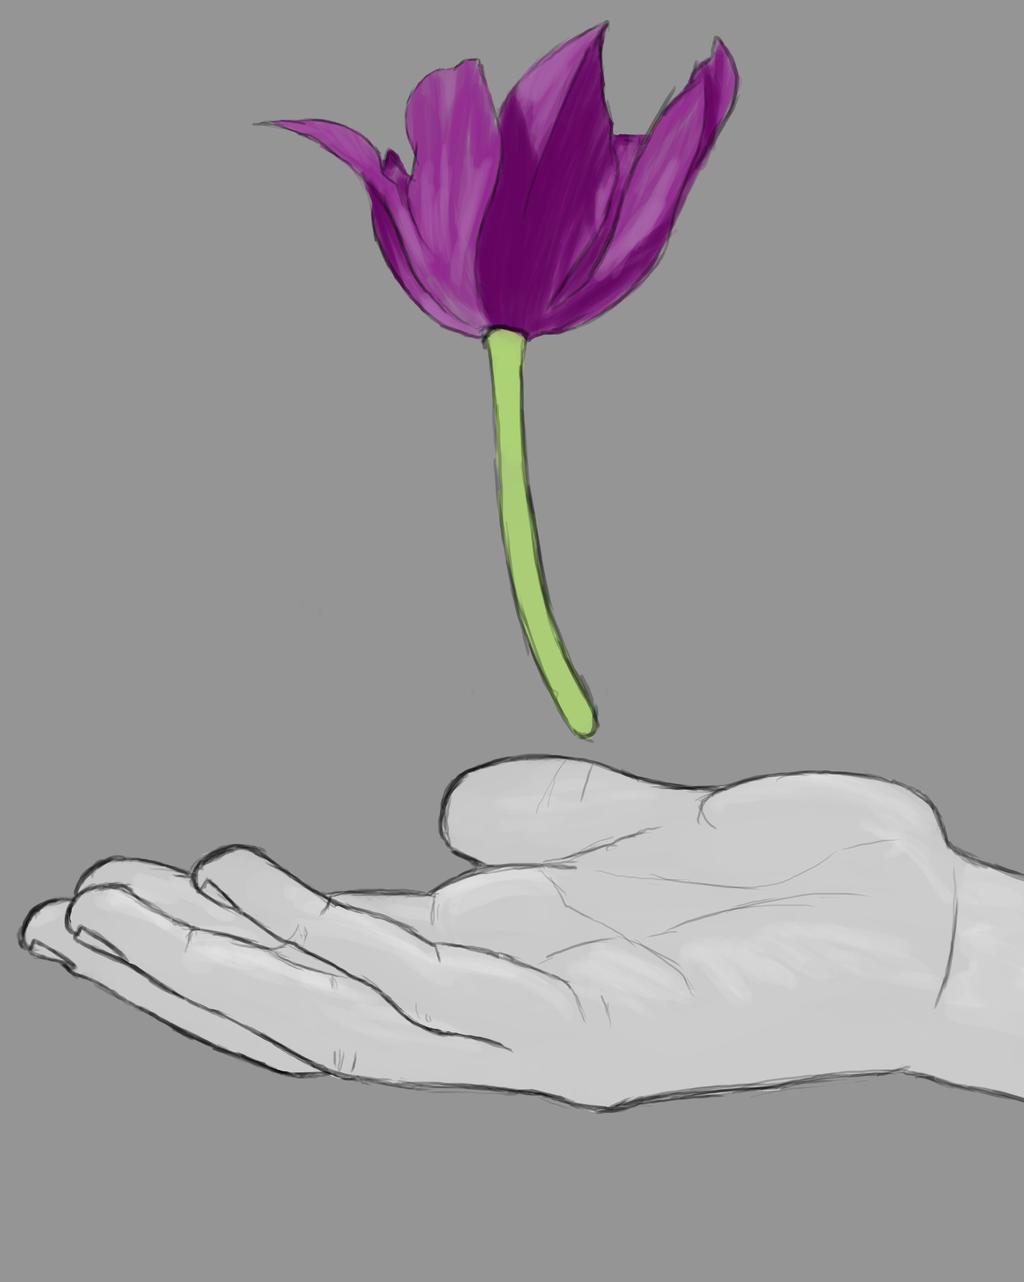 Flower Hand Daily sketch #743 by GothicVampireFreak